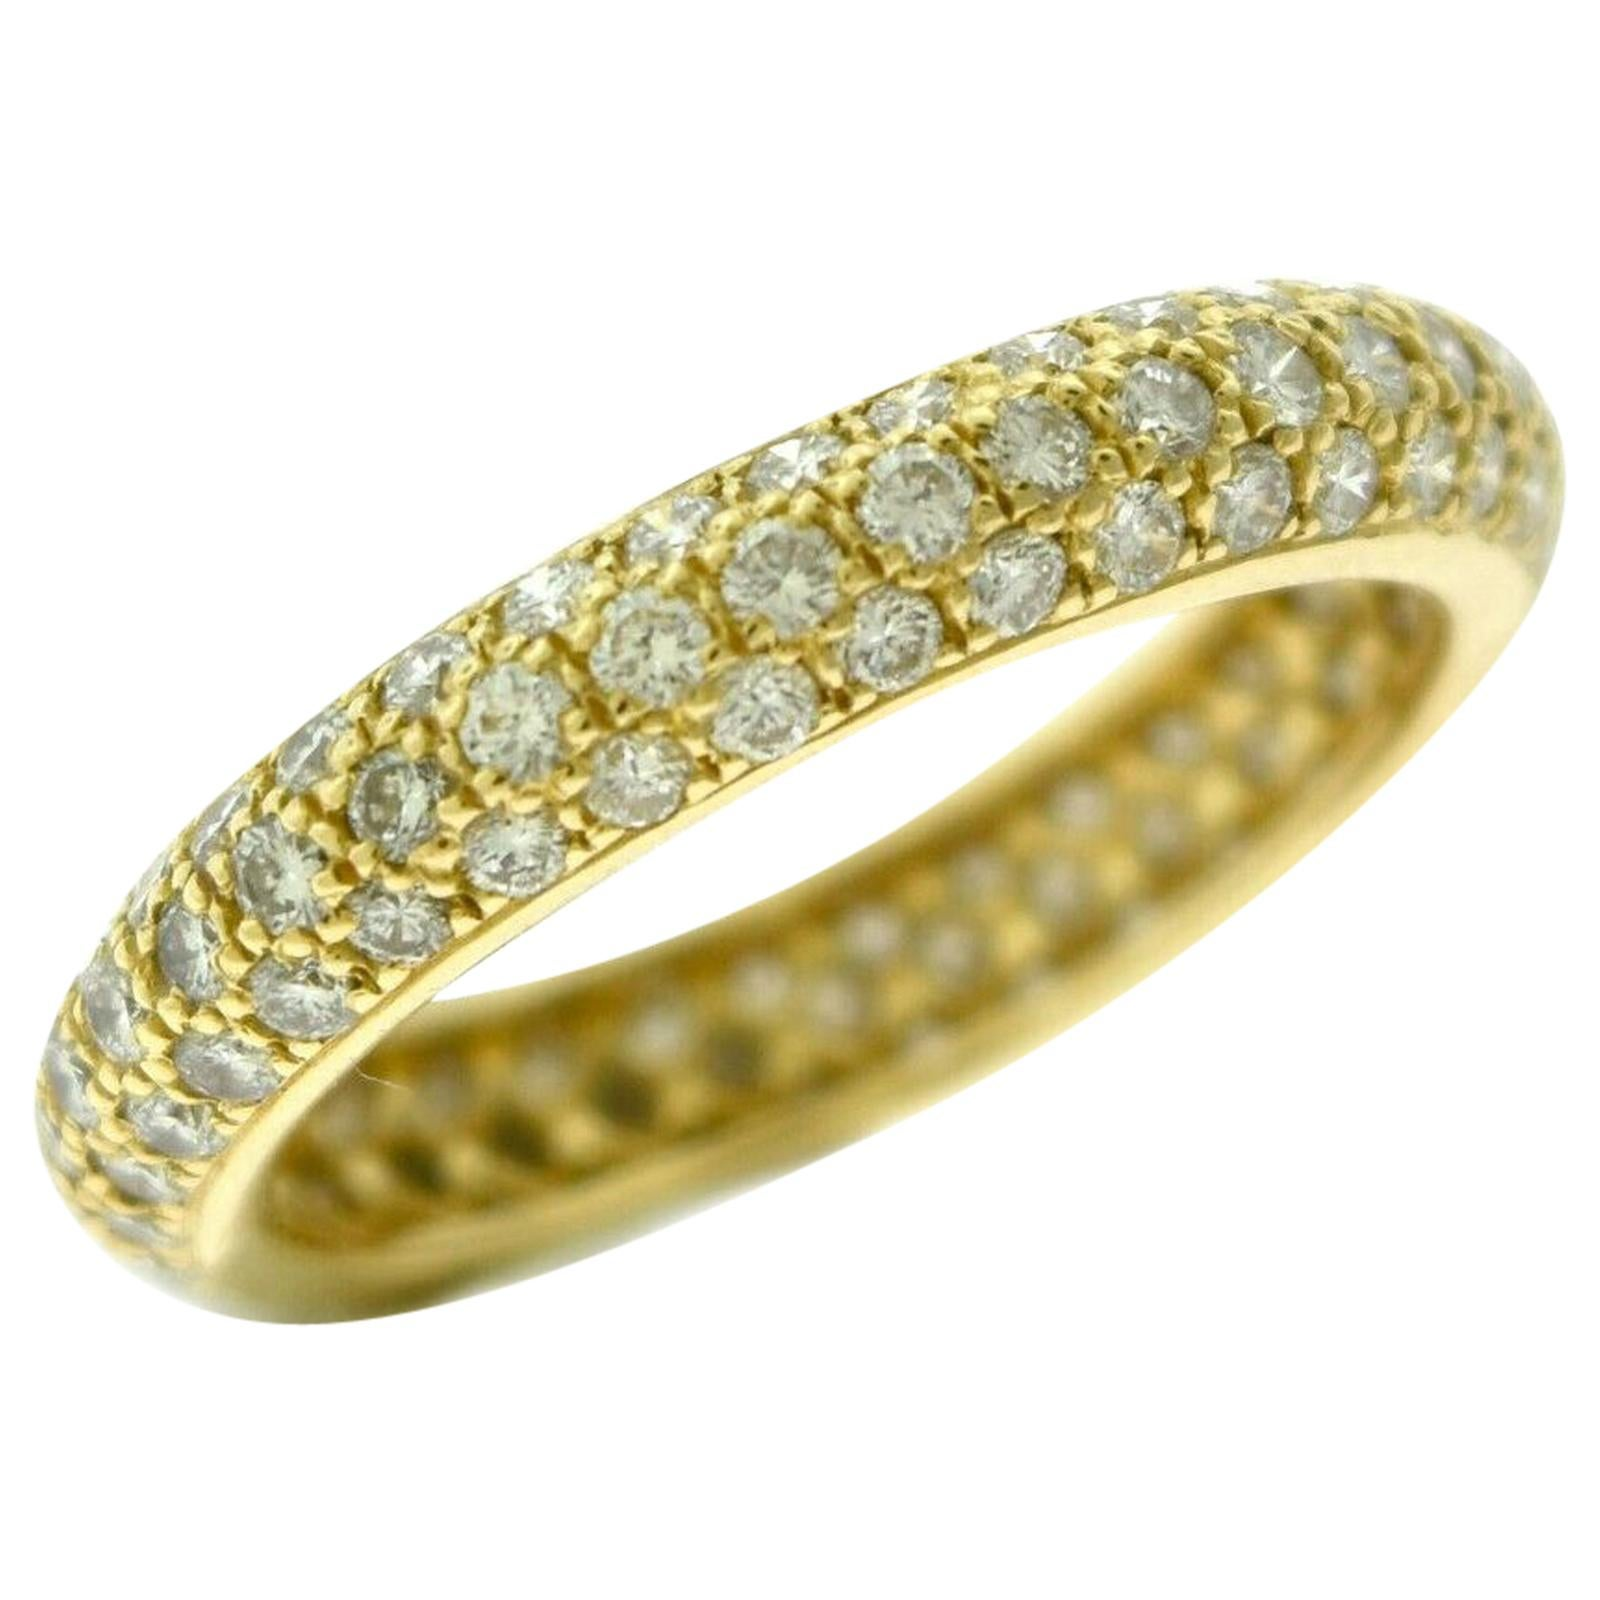 Cartier French Three-Row Diamond Eternity 18 Karat Yellow Gold Band Ring